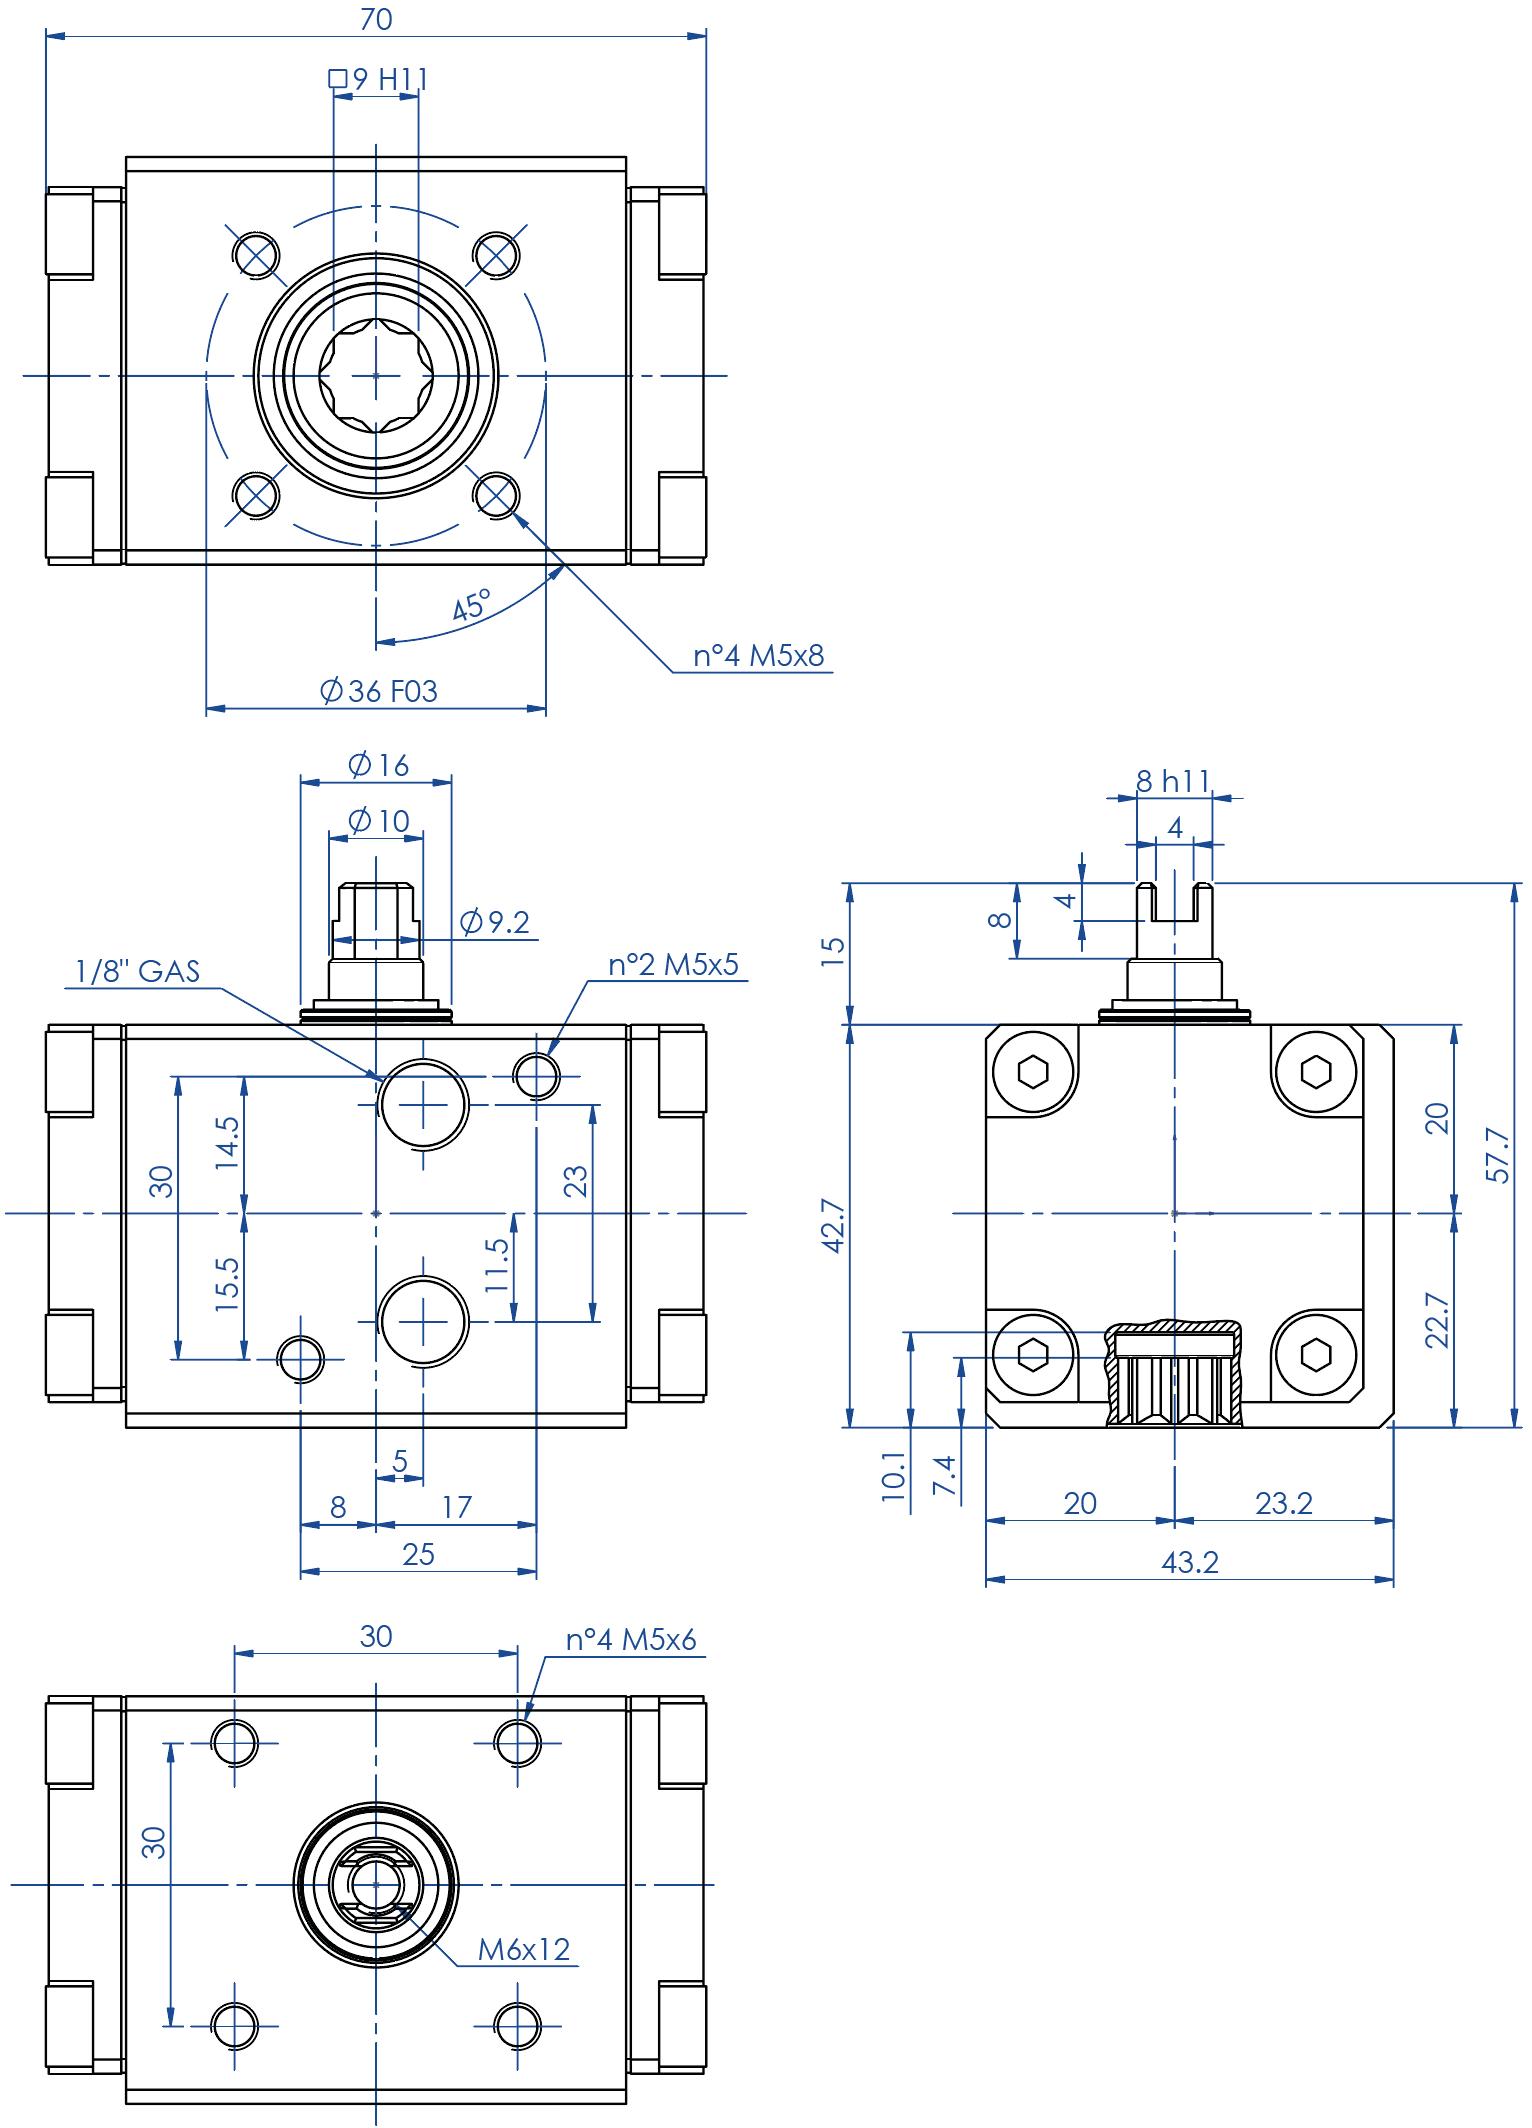 Actuador neumático efecto doble GD de aluminio - dimensiones - Actuador doble efecto medida GD08 (Nm)